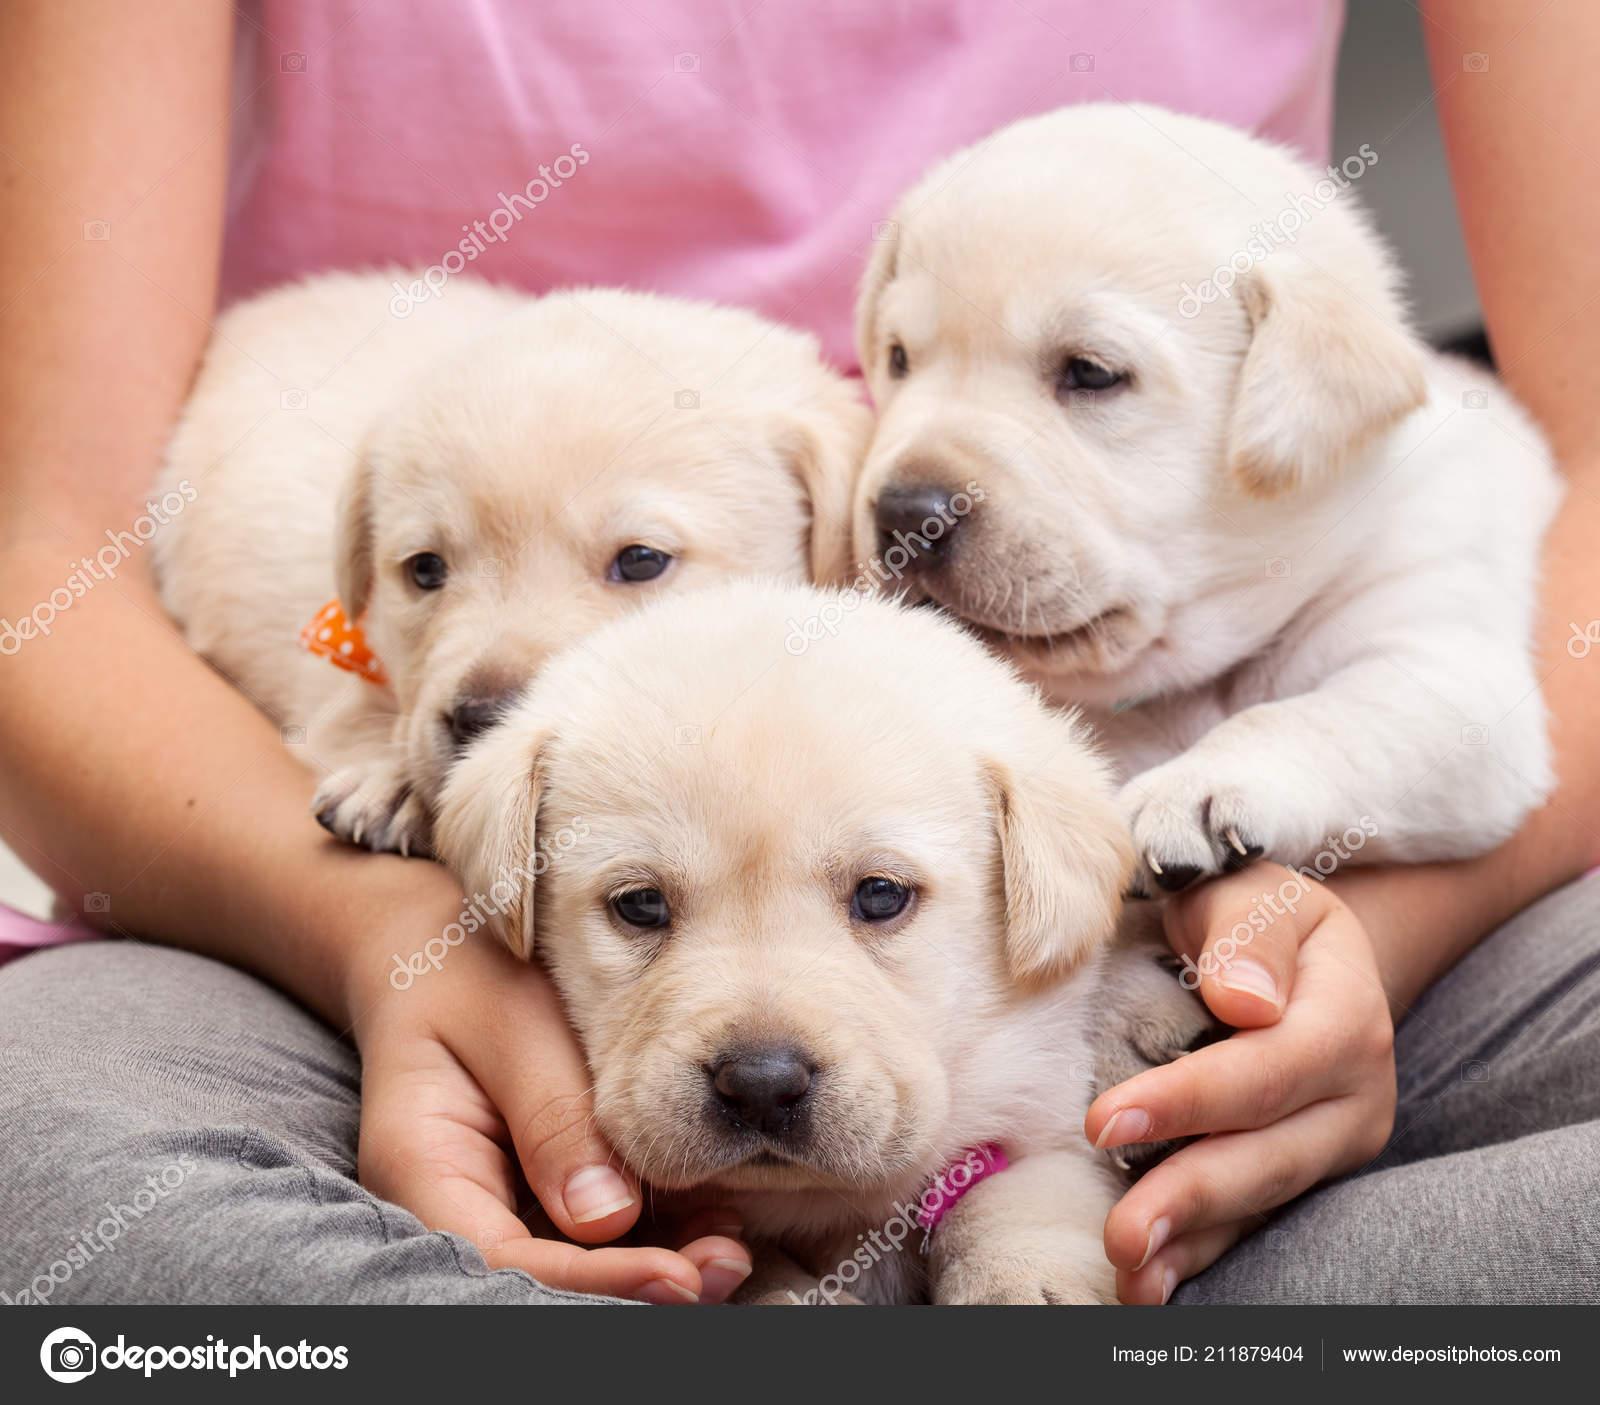 Young Girl Holding Three Adorable Labrador Puppies Her Lap Closeup